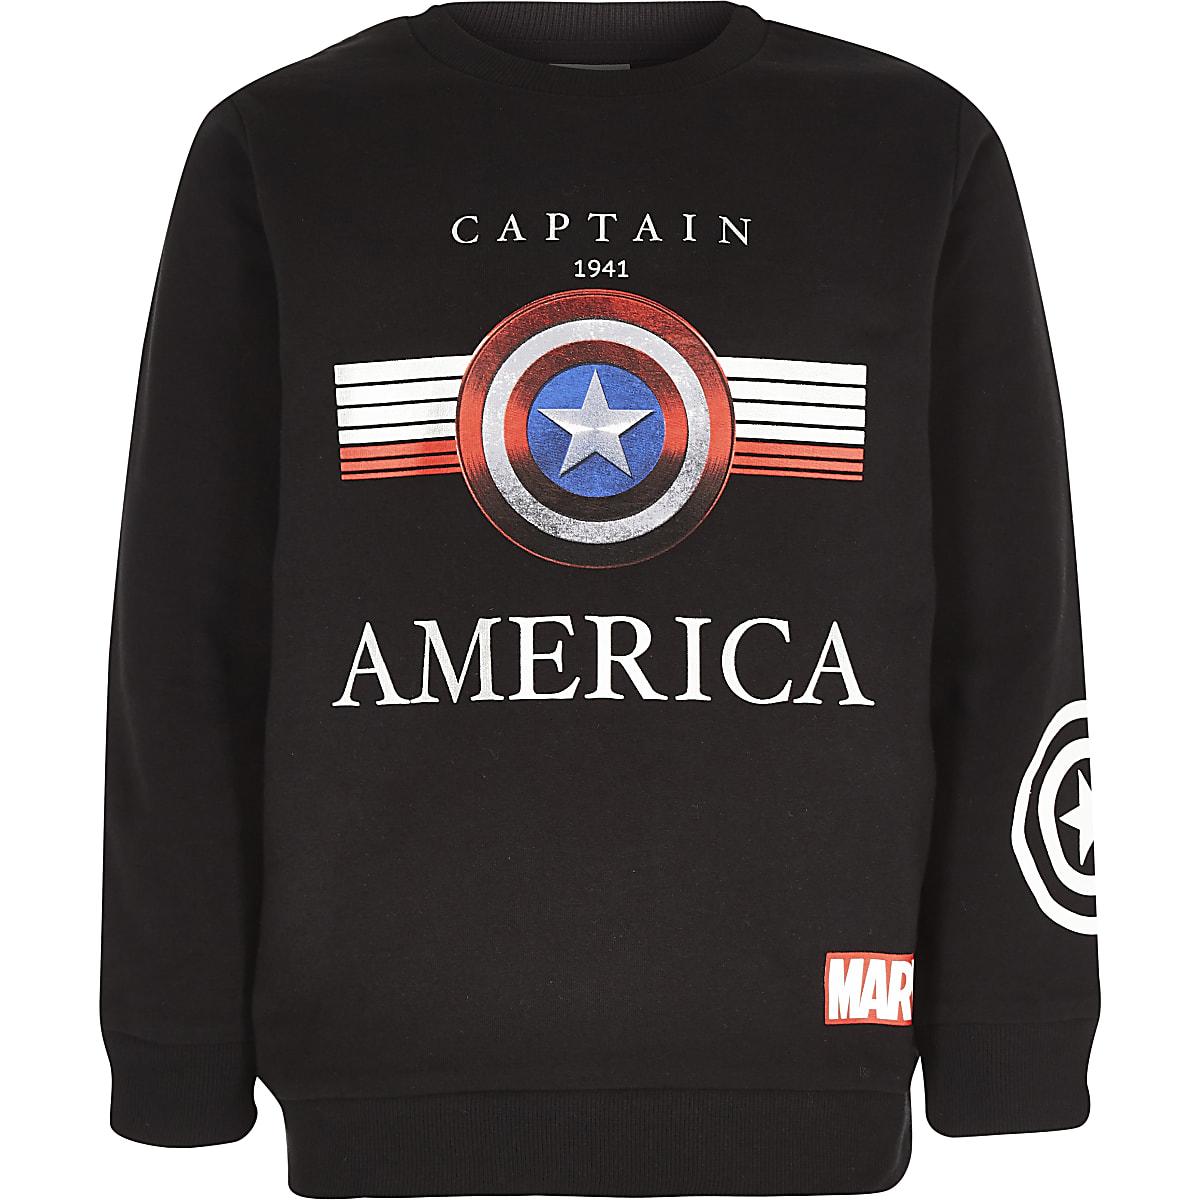 Schwarzes Sweatshirt mit Captain-America-Print